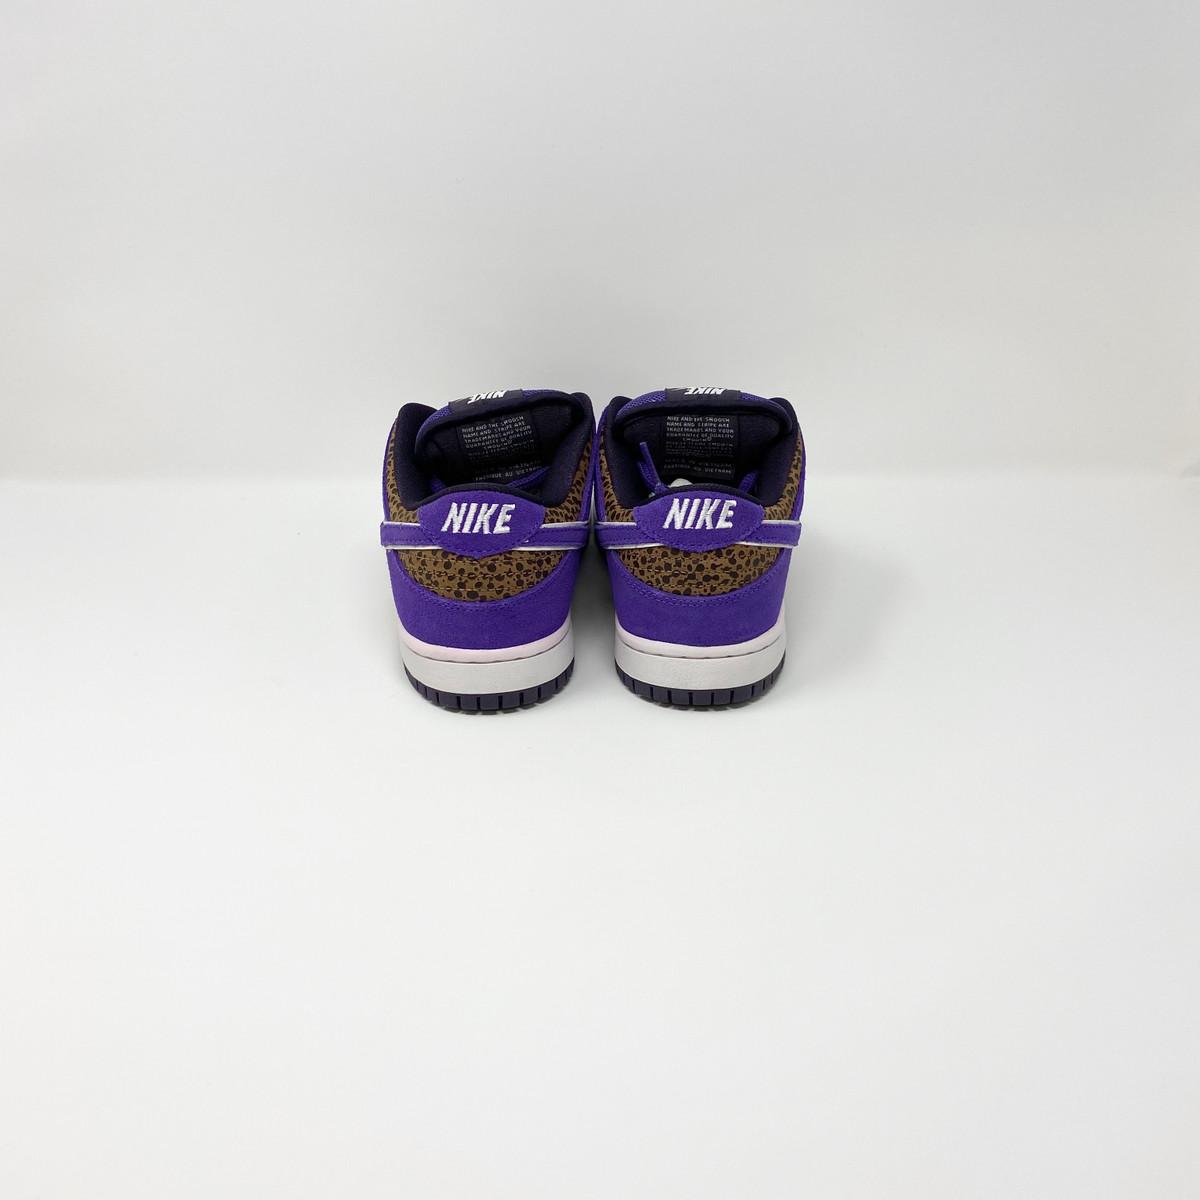 Nike Dunk Low Prem SB Purple Safari